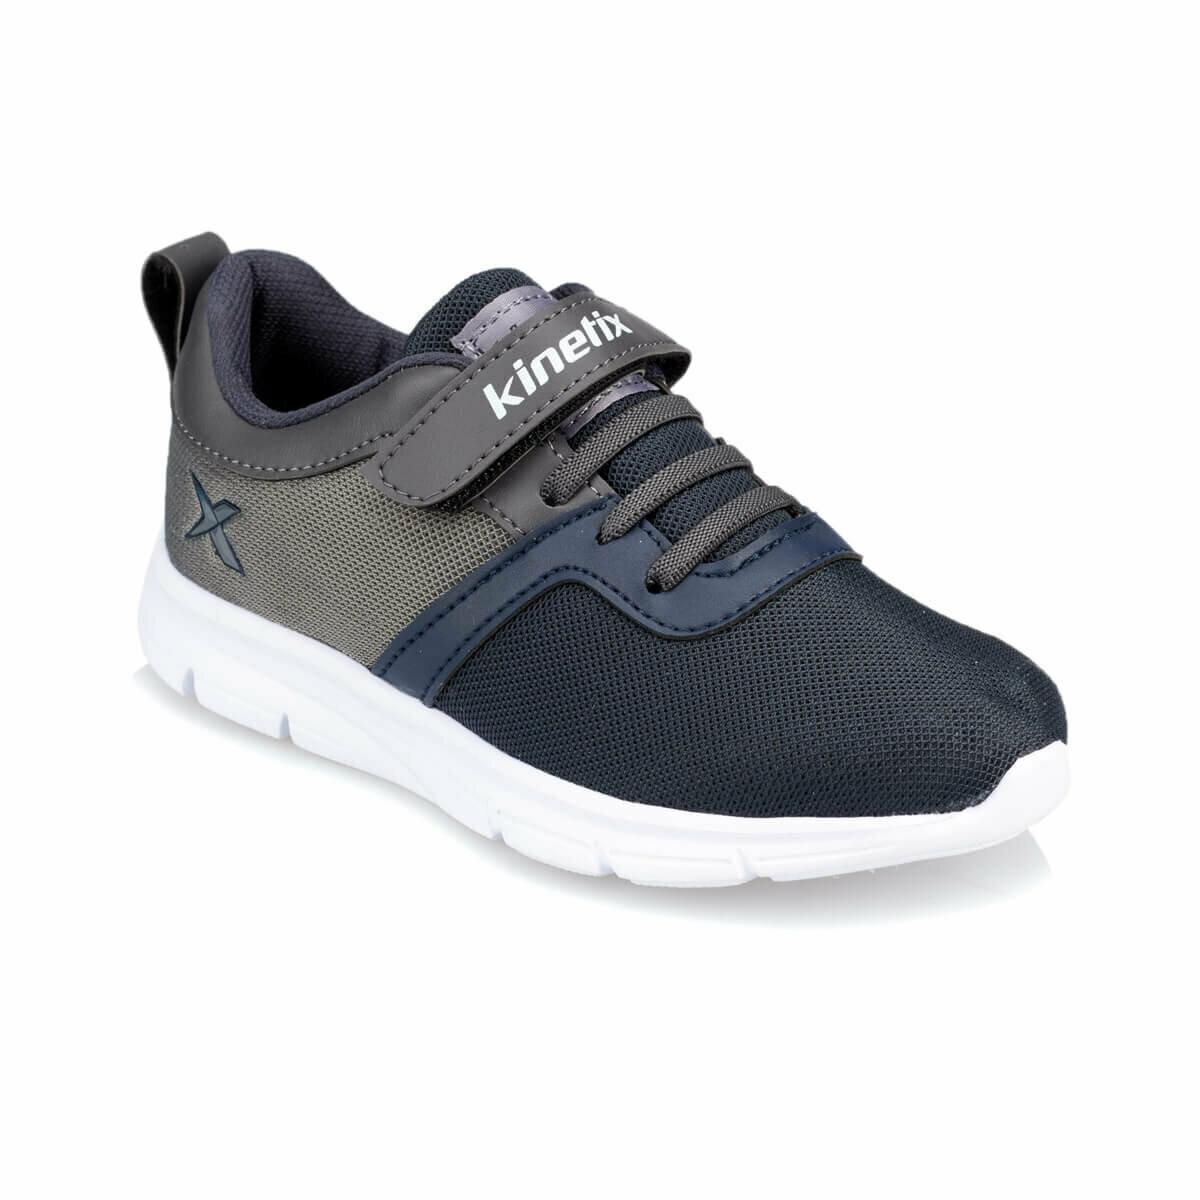 FLO PHOENIX Navy Blue Male Child Hiking Shoes KINETIX